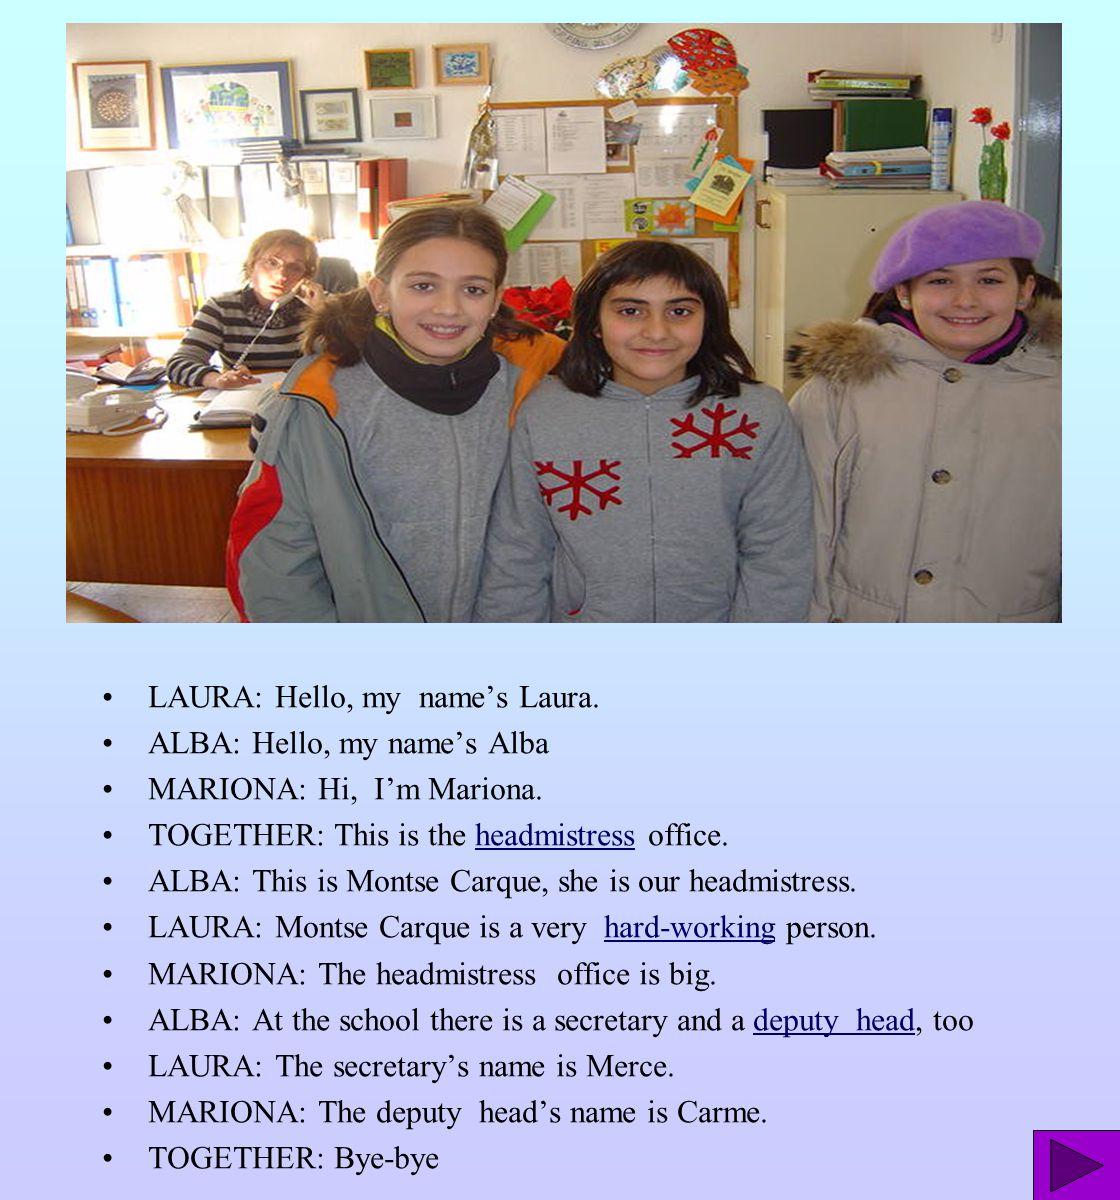 LAURA: Hello, my name's Laura. ALBA: Hello, my name's Alba MARIONA: Hi, I'm Mariona. TOGETHER: This is the headmistress office.headmistress ALBA: This